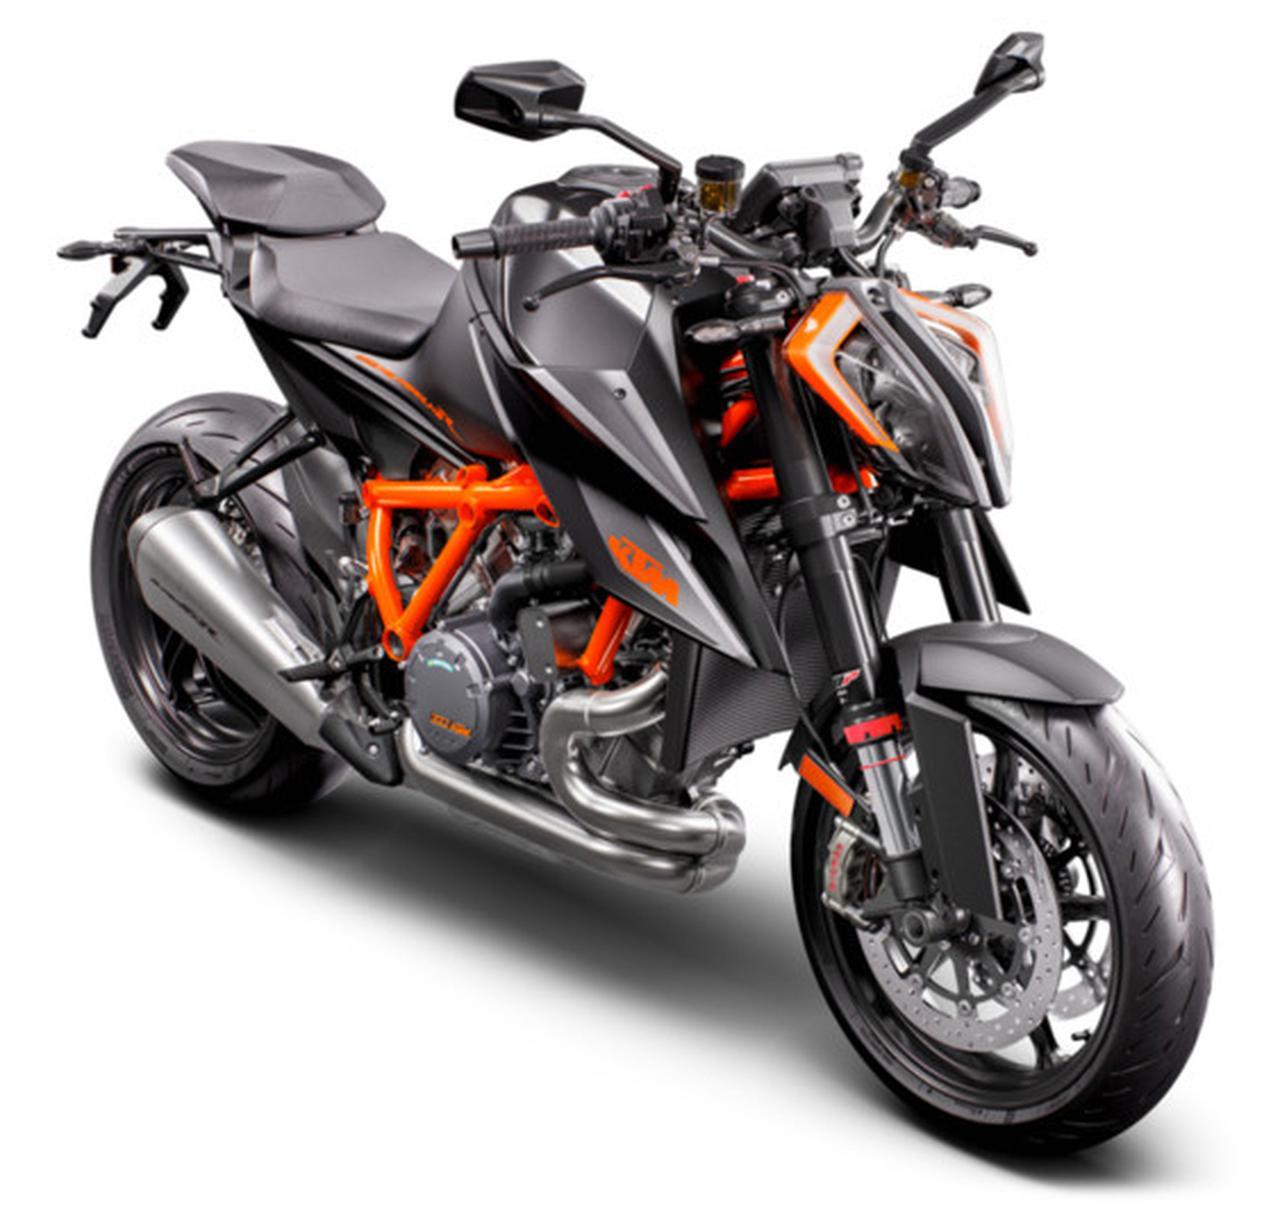 Images : 4番目の画像 - KTM「1290 SUPER DUKE R」の写真を全て見る! - webオートバイ